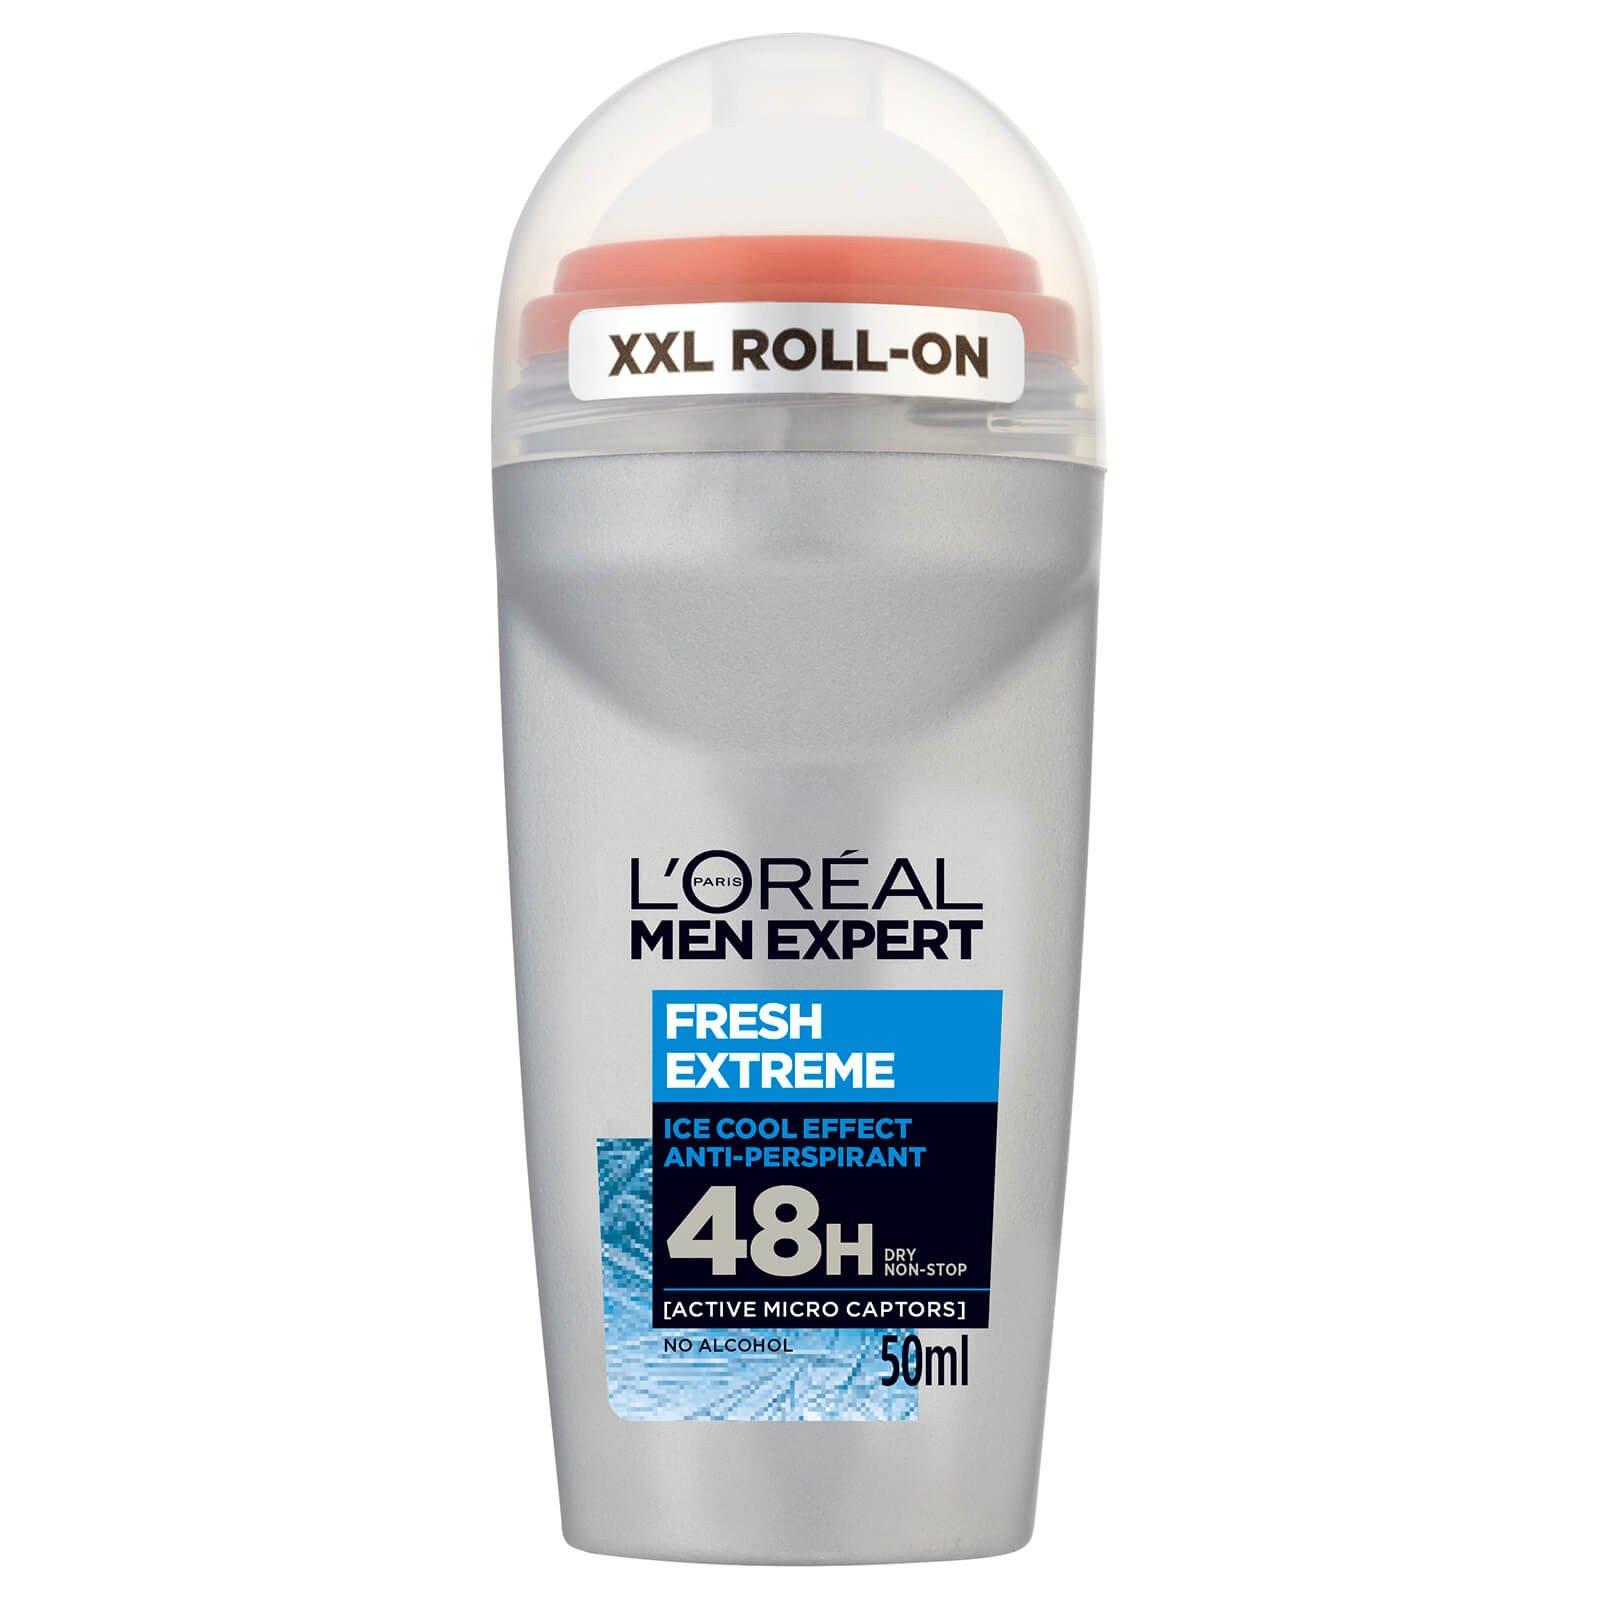 L'oreal Paris Men Expert Fresh Extreme Roll-On Ανδρικό Αποσμητικό με 48ωρη Ολική Προστασία για Στεγνή Επιδερμίδα 50ml